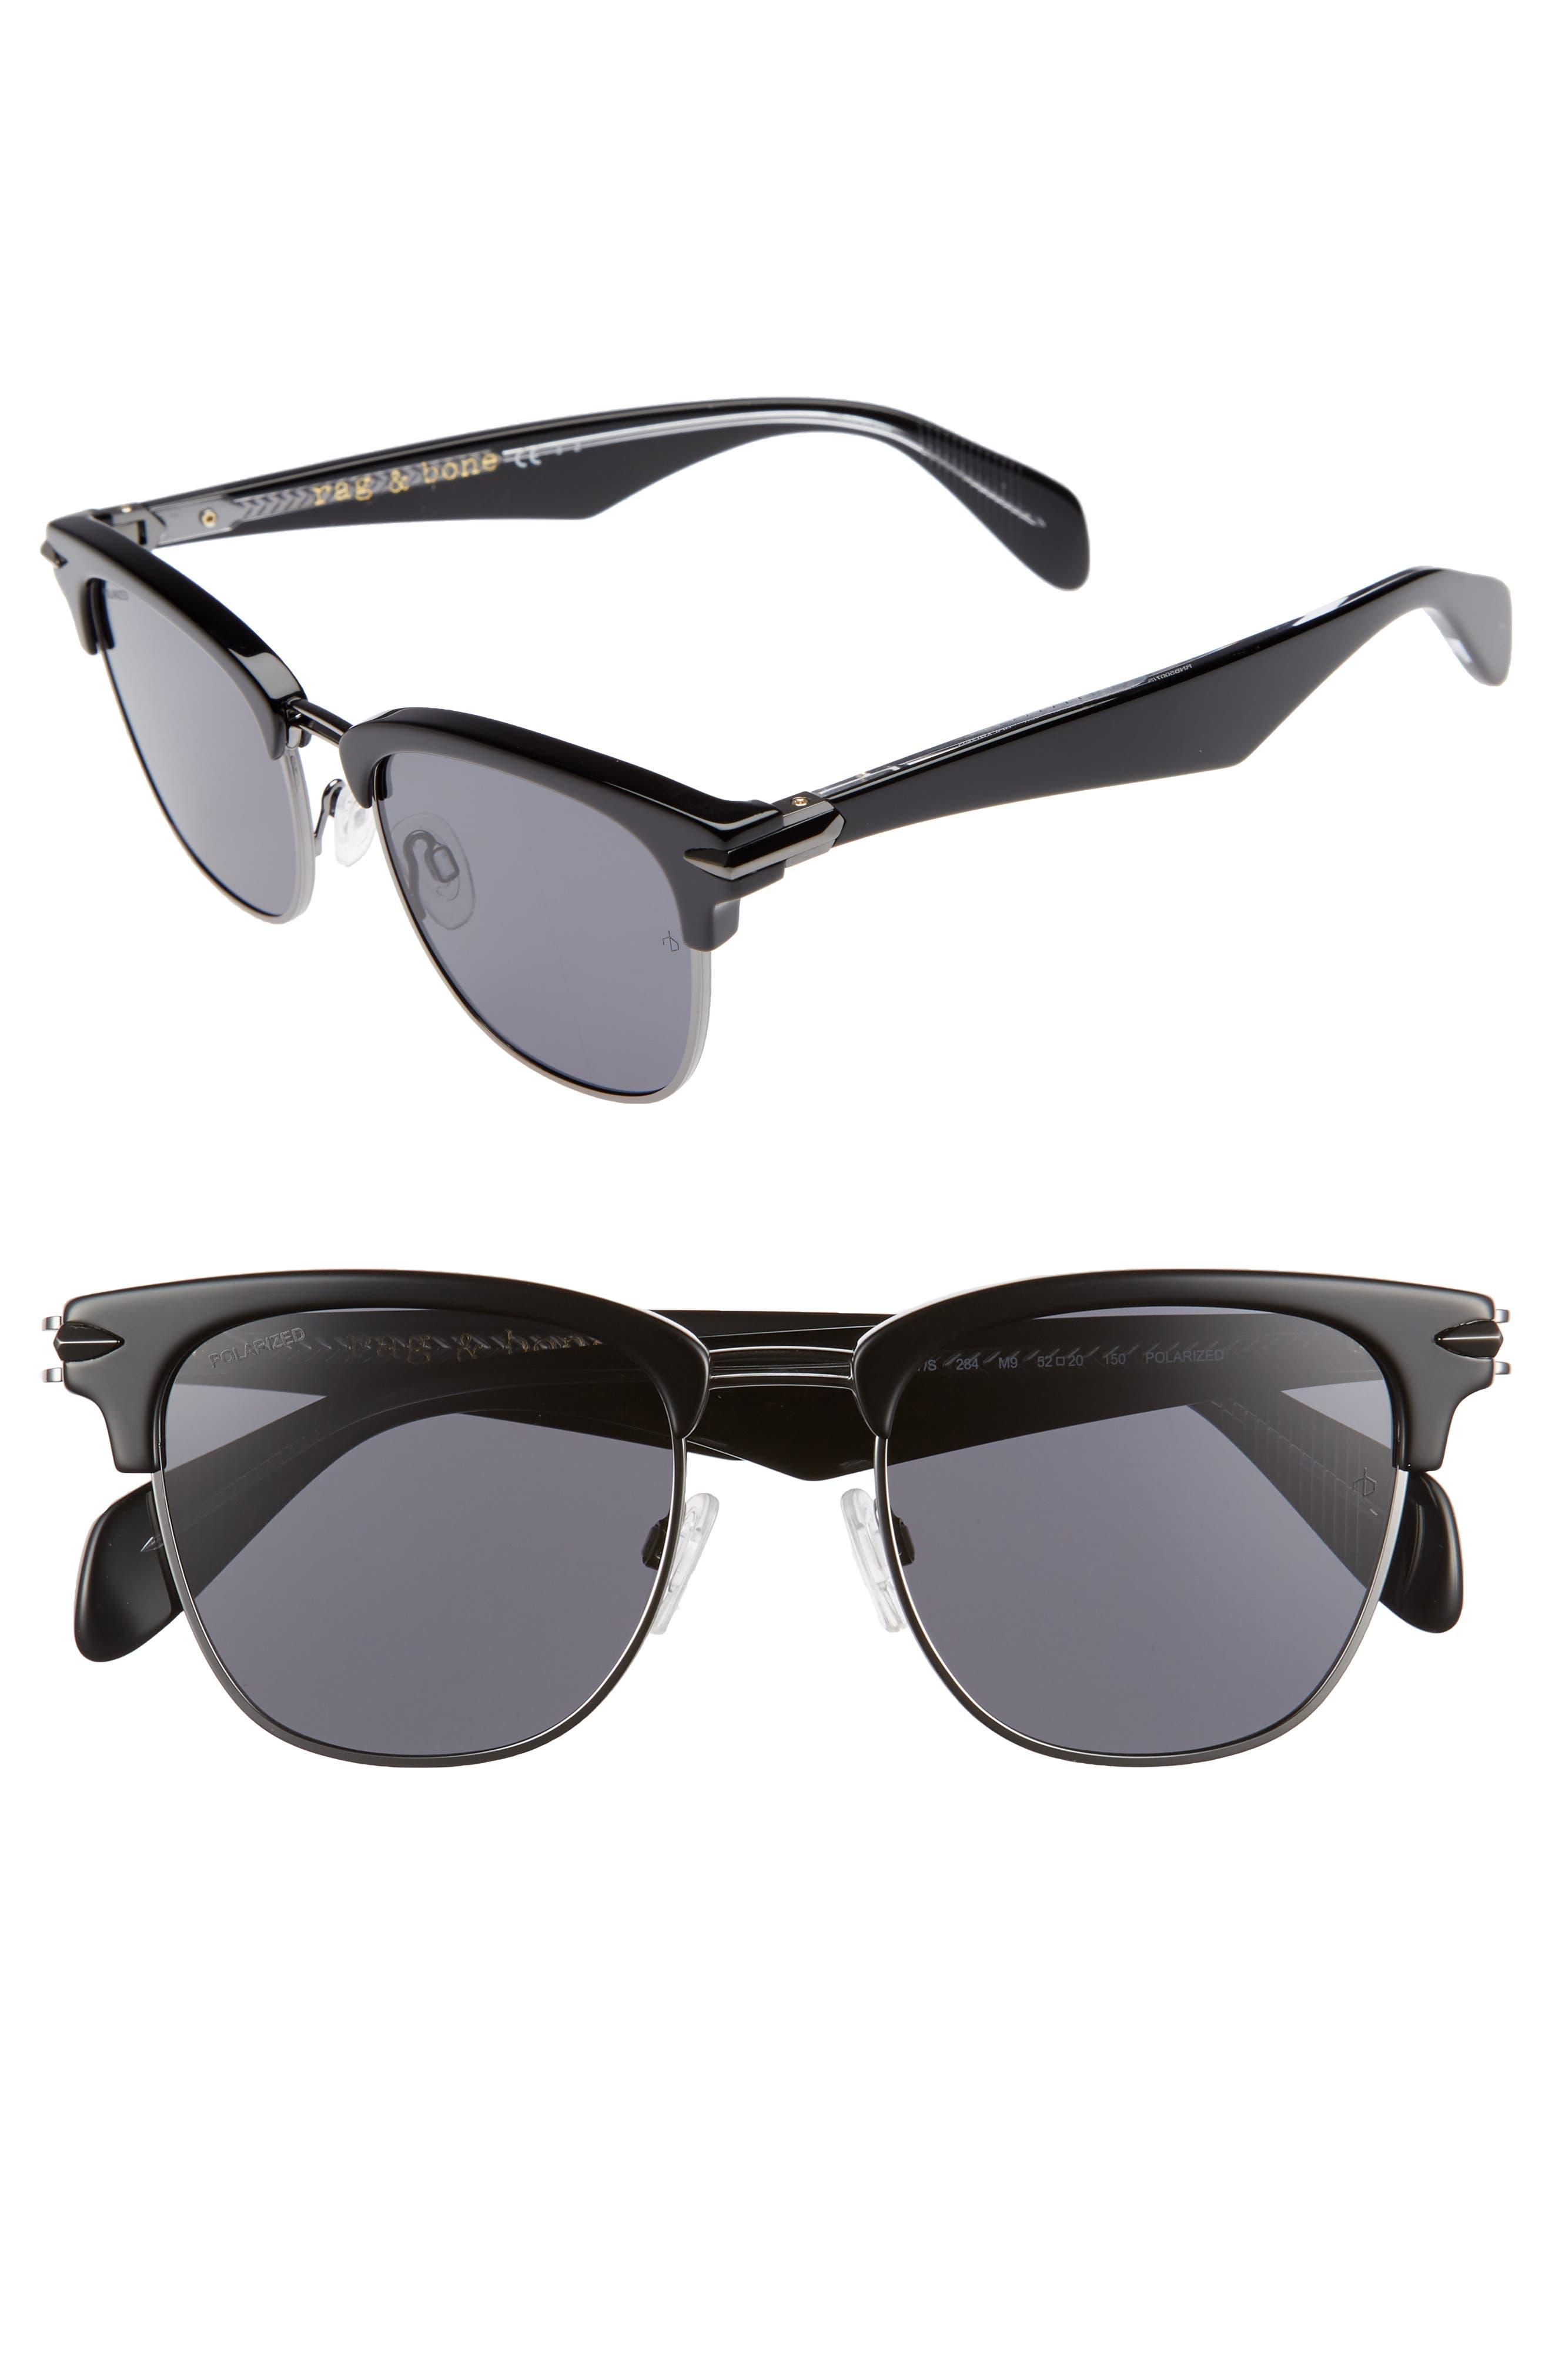 52mm Polarized Sunglasses,                             Main thumbnail 1, color,                             Black Ruth/ Polar